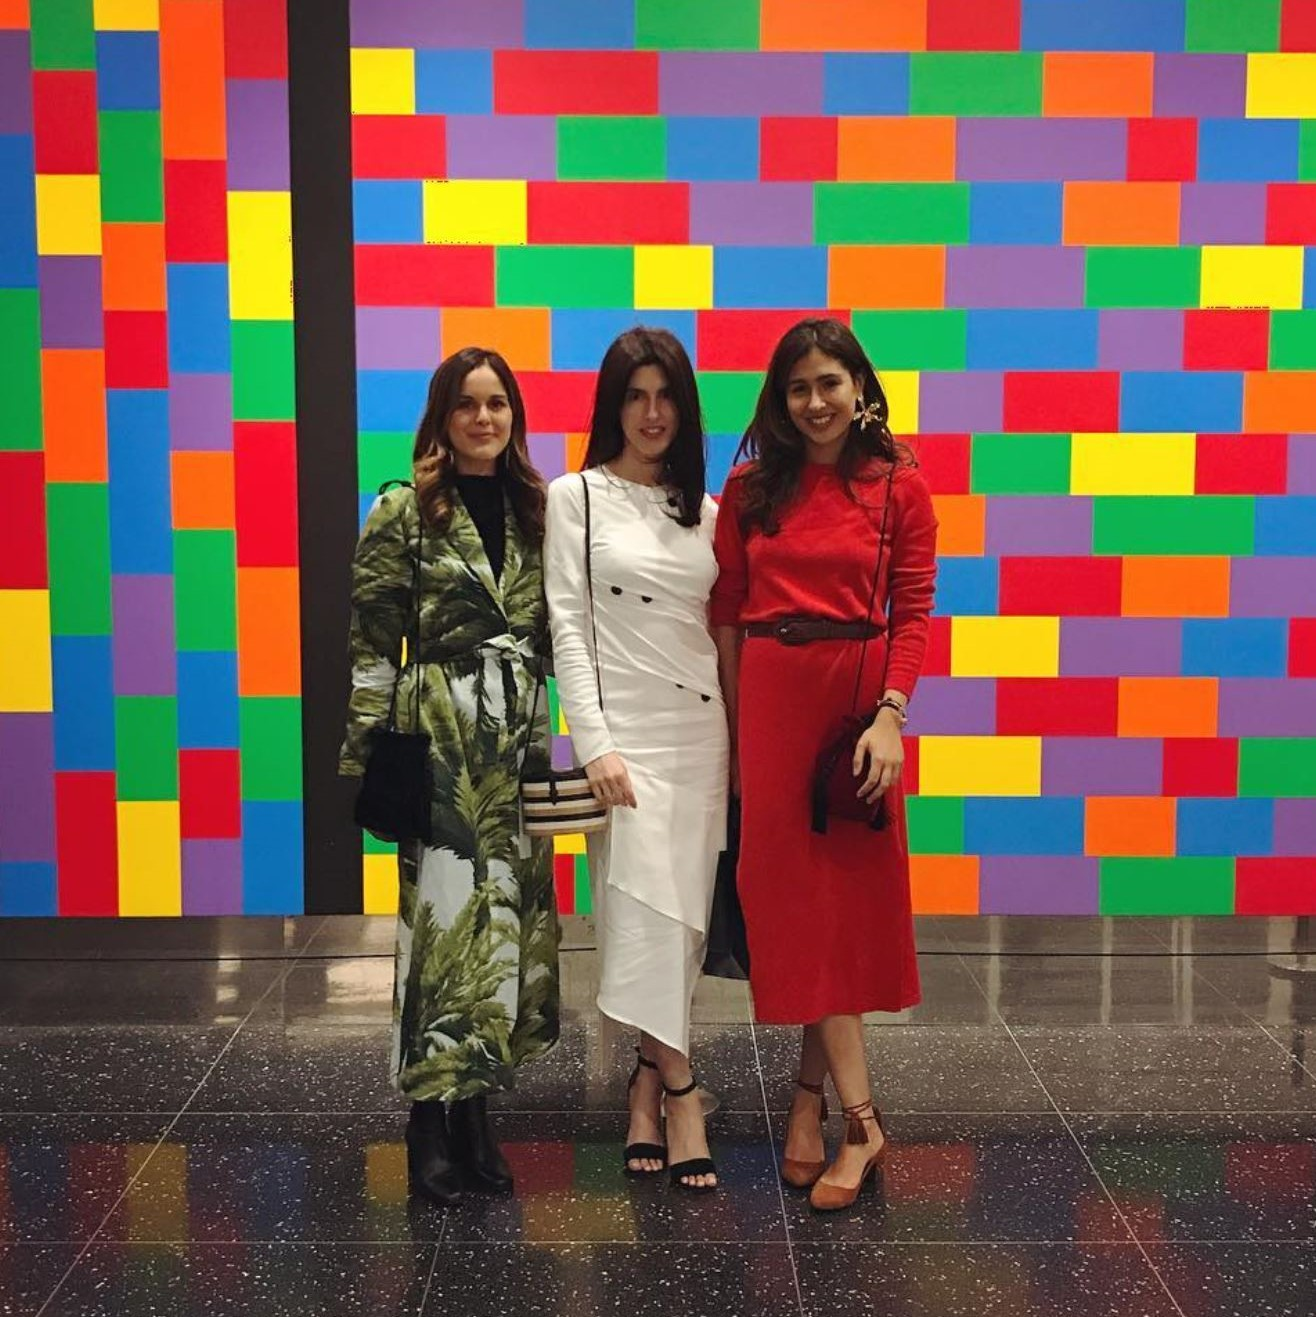 GIOVANNA CAMPAGNA and DANIELLE CORONA  #designer #huntingseason #creoconsulting #almagirl #girlboss  @ Carolina Herrera Runway Show NYFW